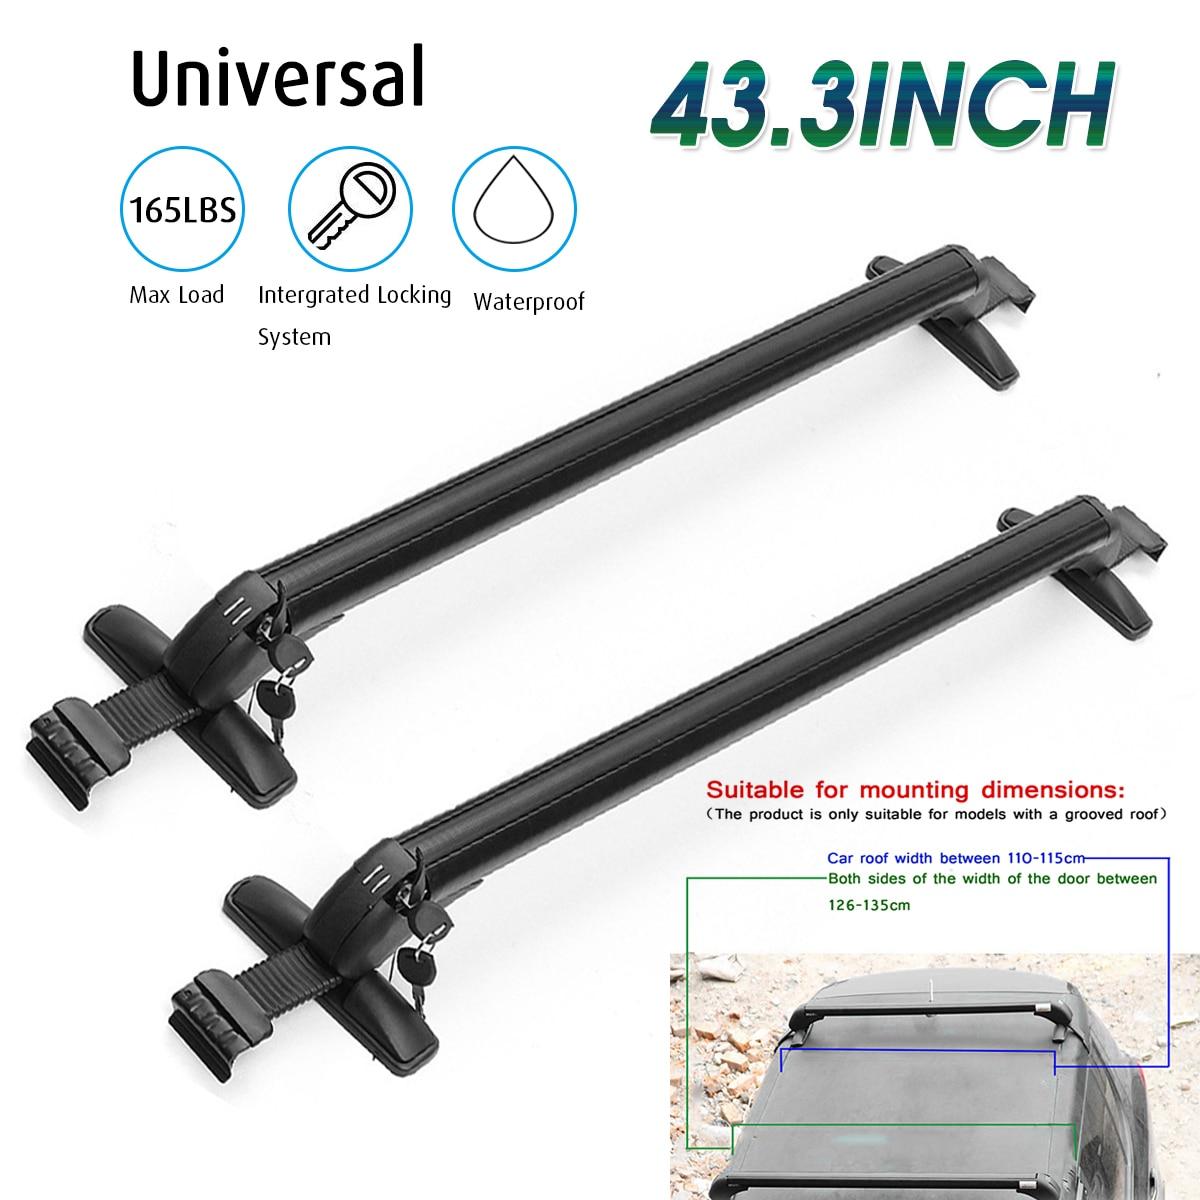 2pcs Universal Car Roof Cross Bar Anti Theft Lockable Bars